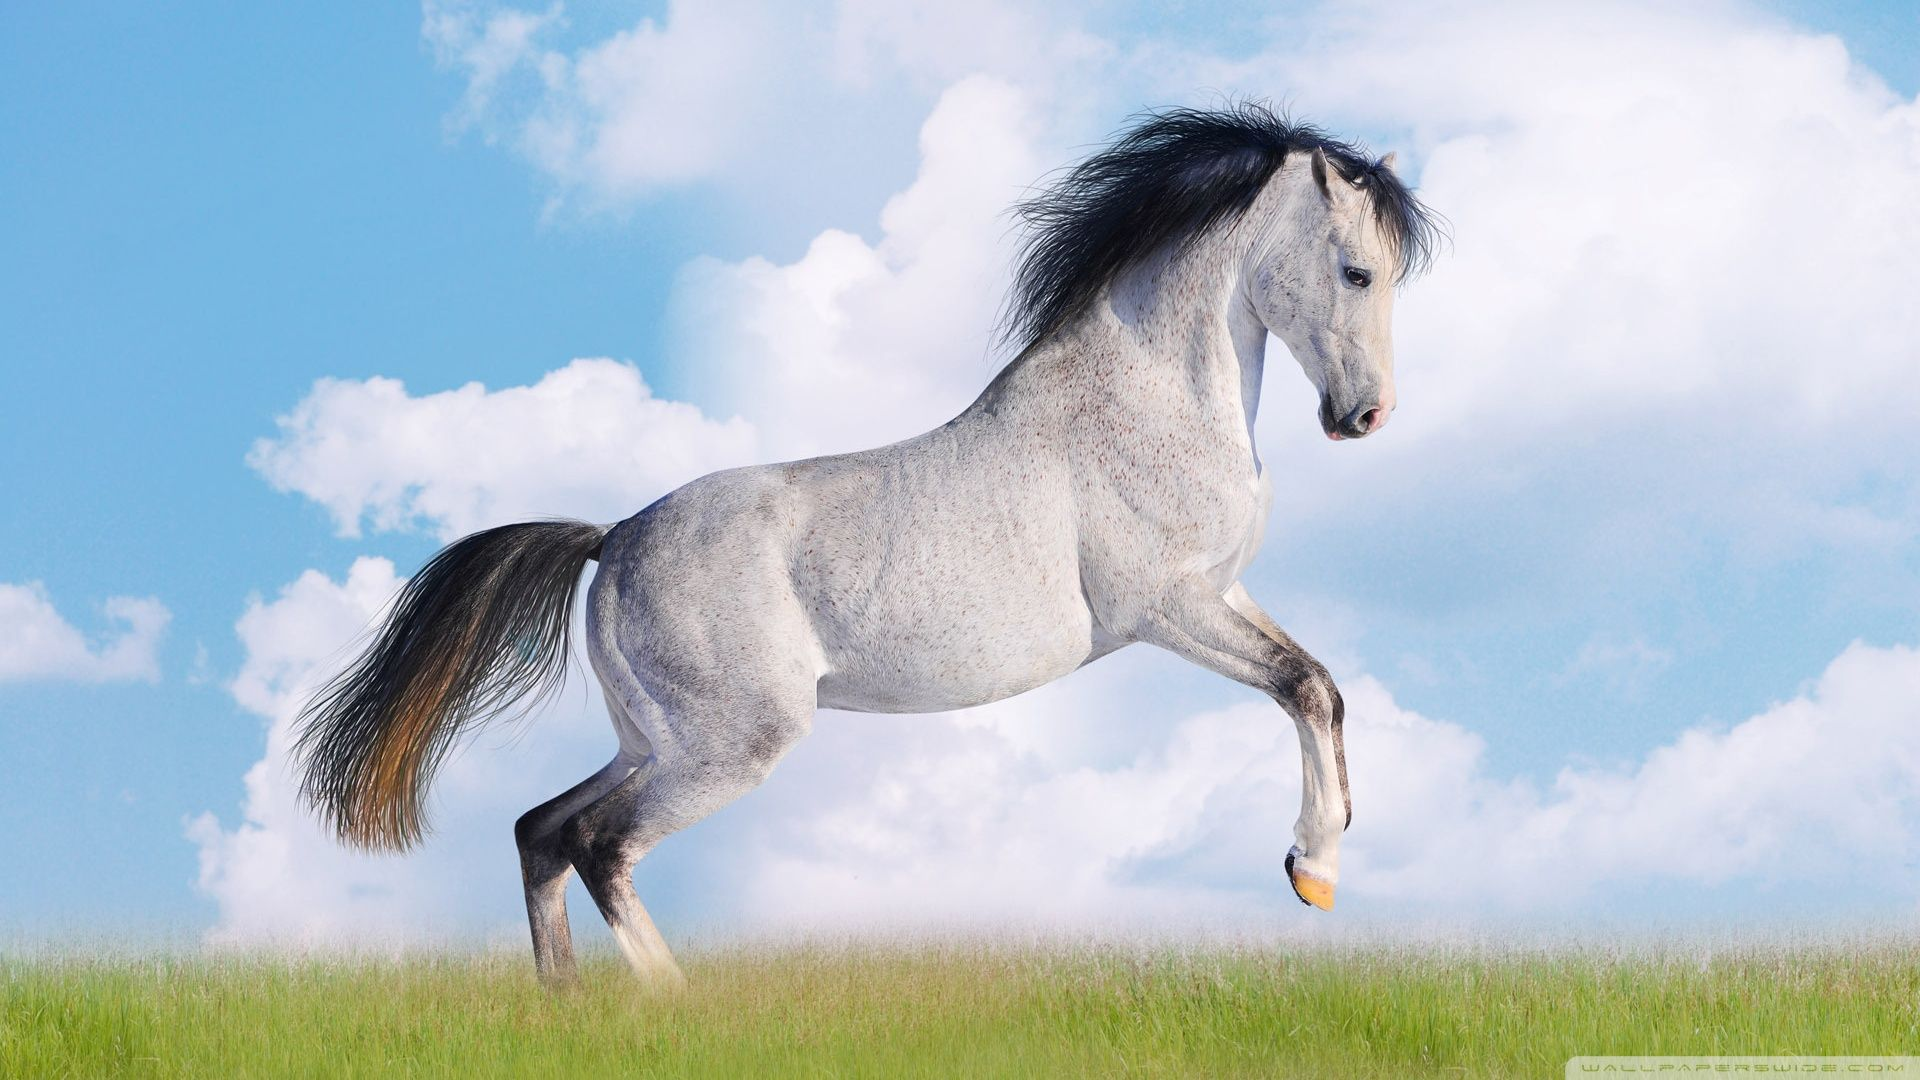 Download Wallpaper Horse High Definition - 4f3bc3fe8e24ccbdf8ab3caa5301f689  Image_223488.jpg